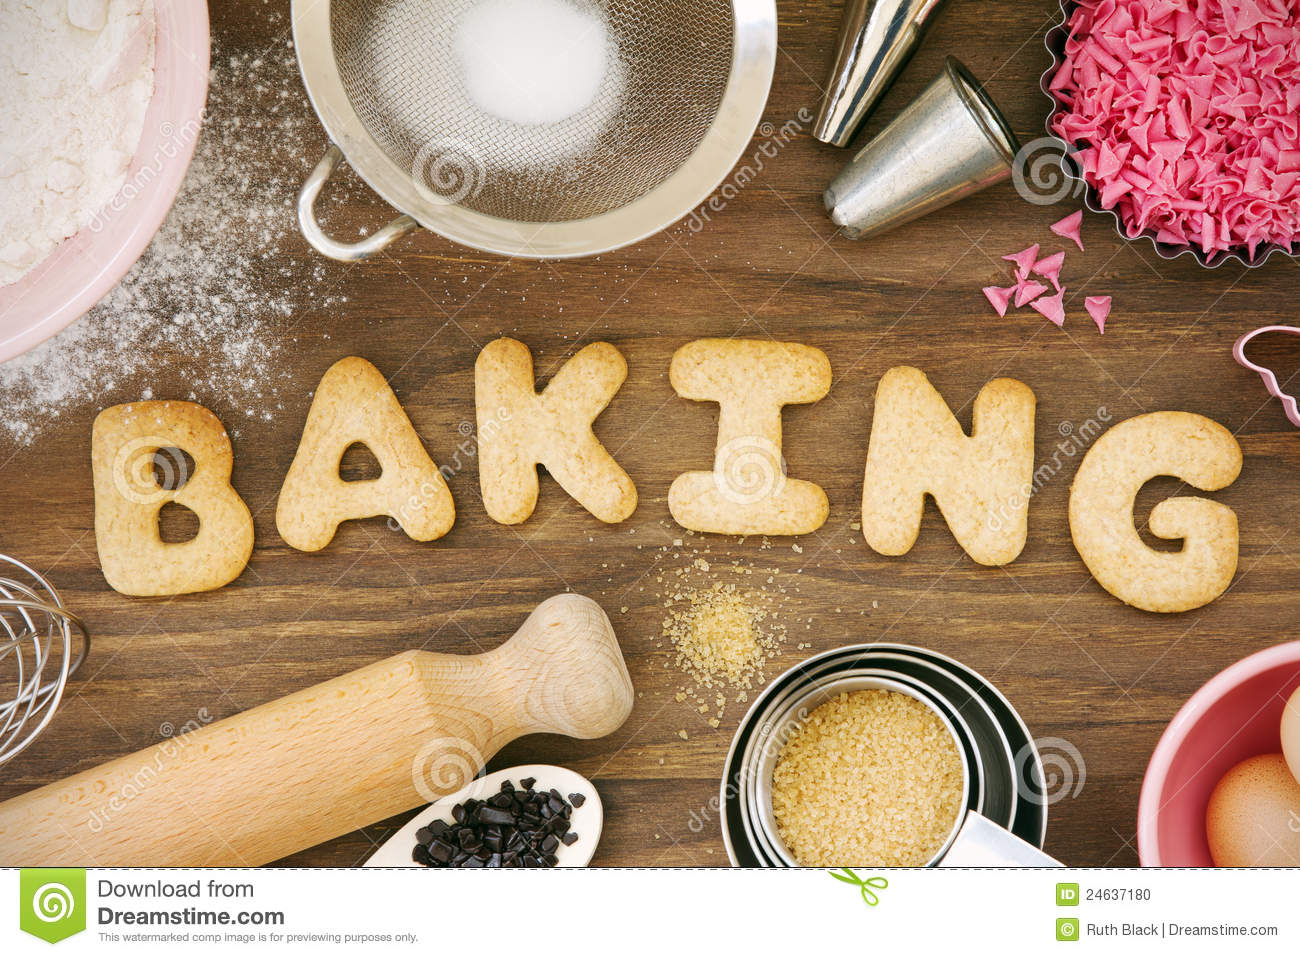 Baking Backgrounds, Compatible - PC, Mobile, Gadgets| 1300x957 px